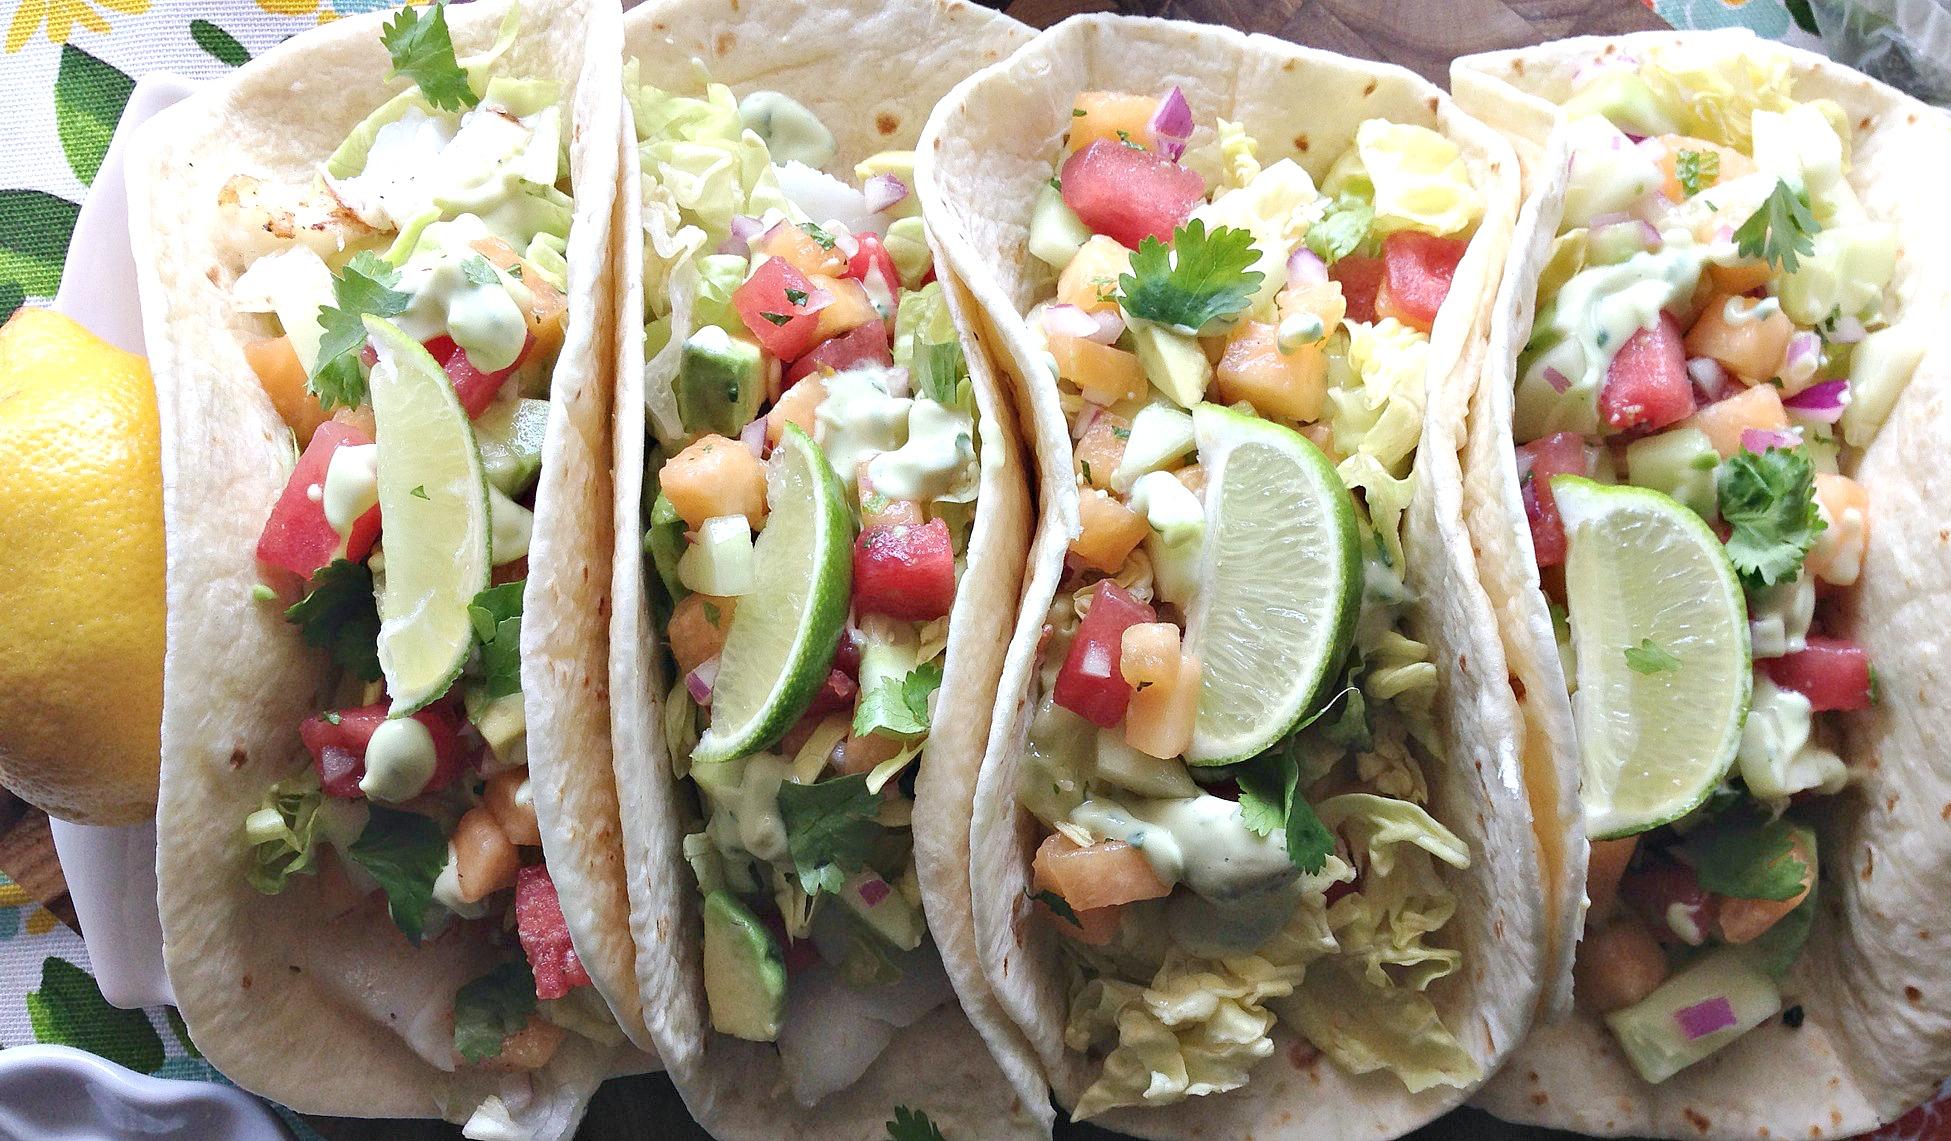 Fish Tacos with Melon Mint Salsa and Avocado Crema